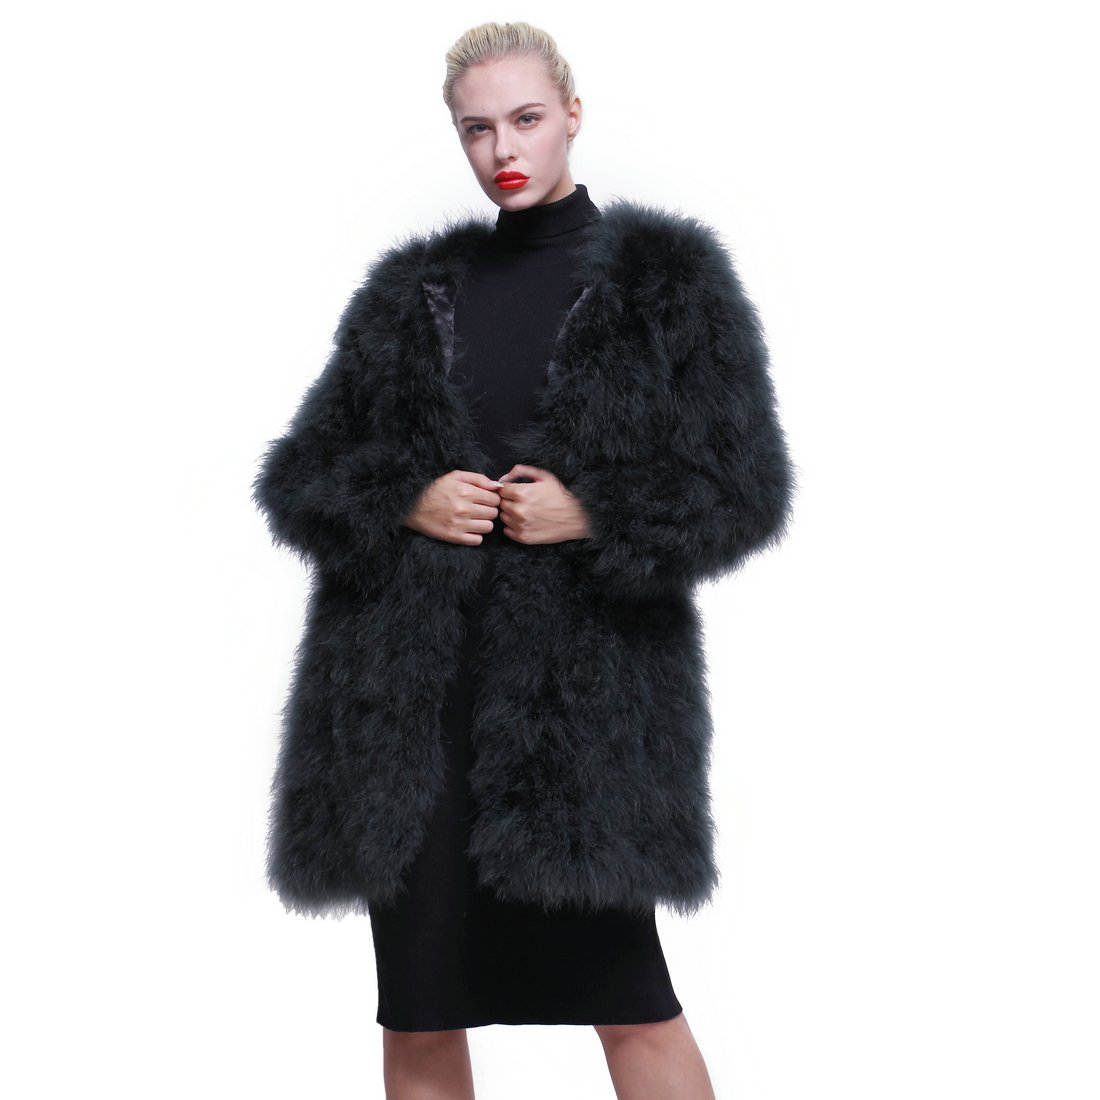 URSFUR Women Winter Jacket Real Ostrich Feather Fur Coat Opal Green XL by URSFUR (Image #1)